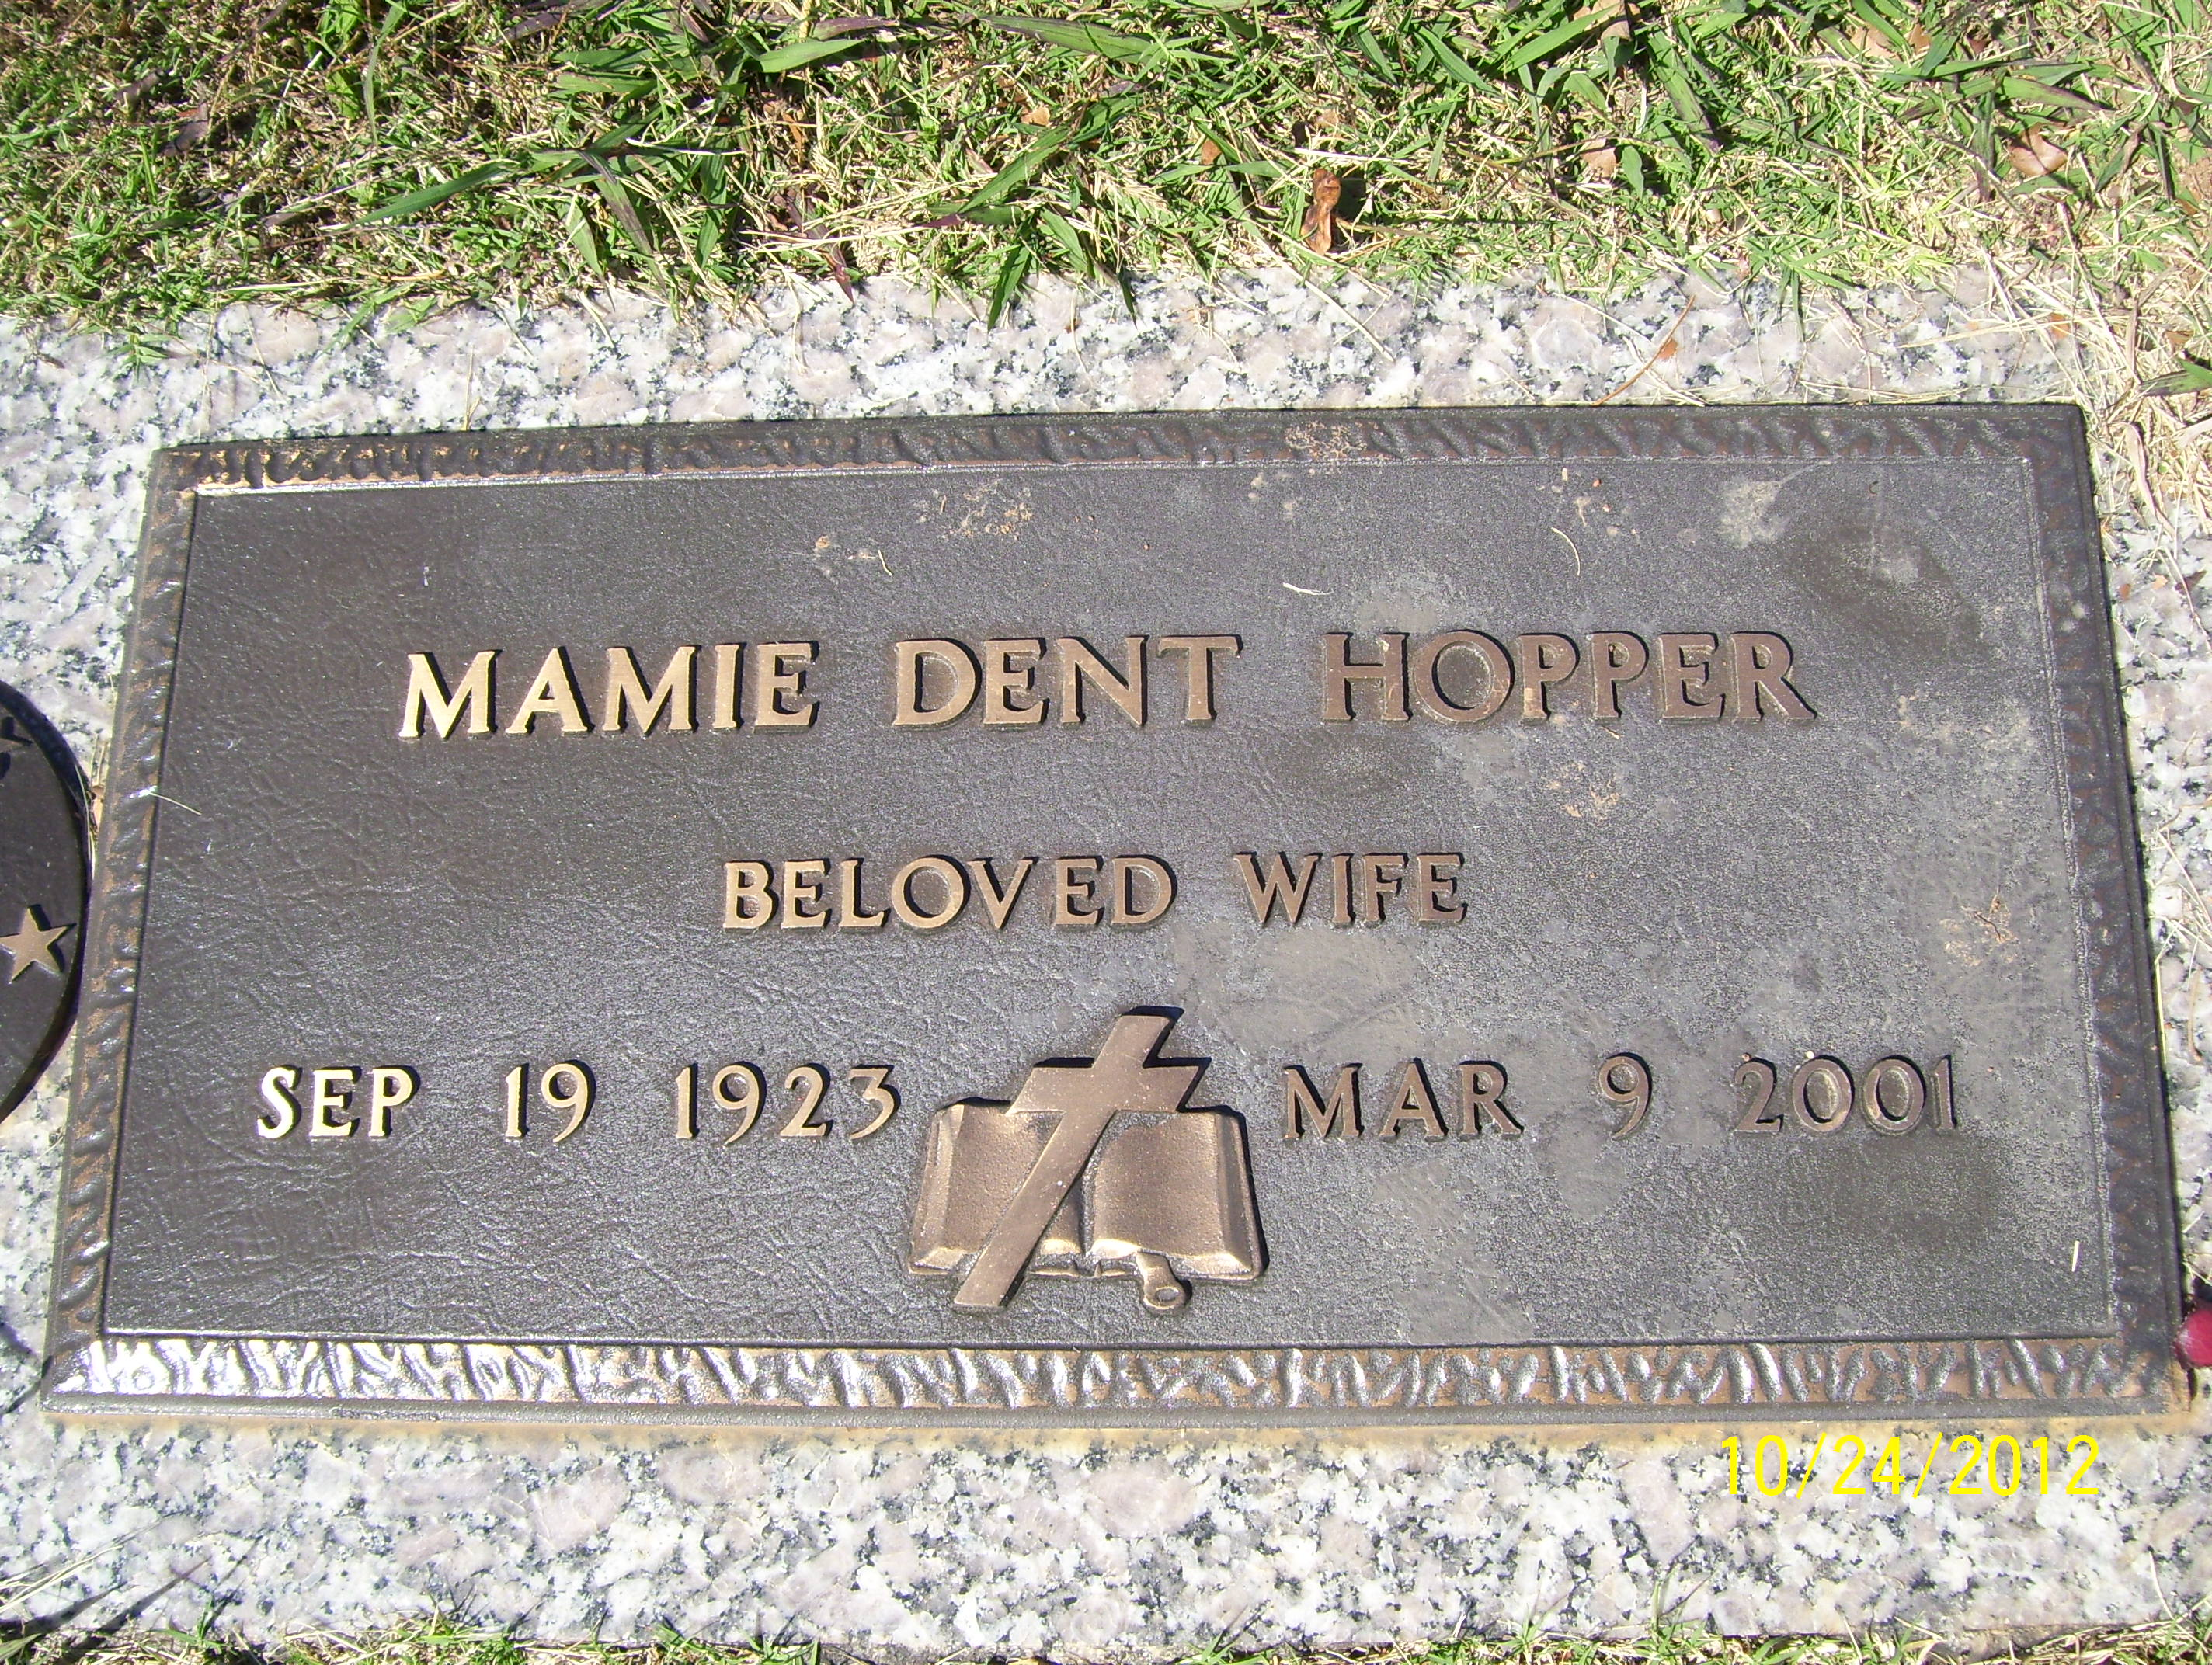 Mamie Dent Hopper